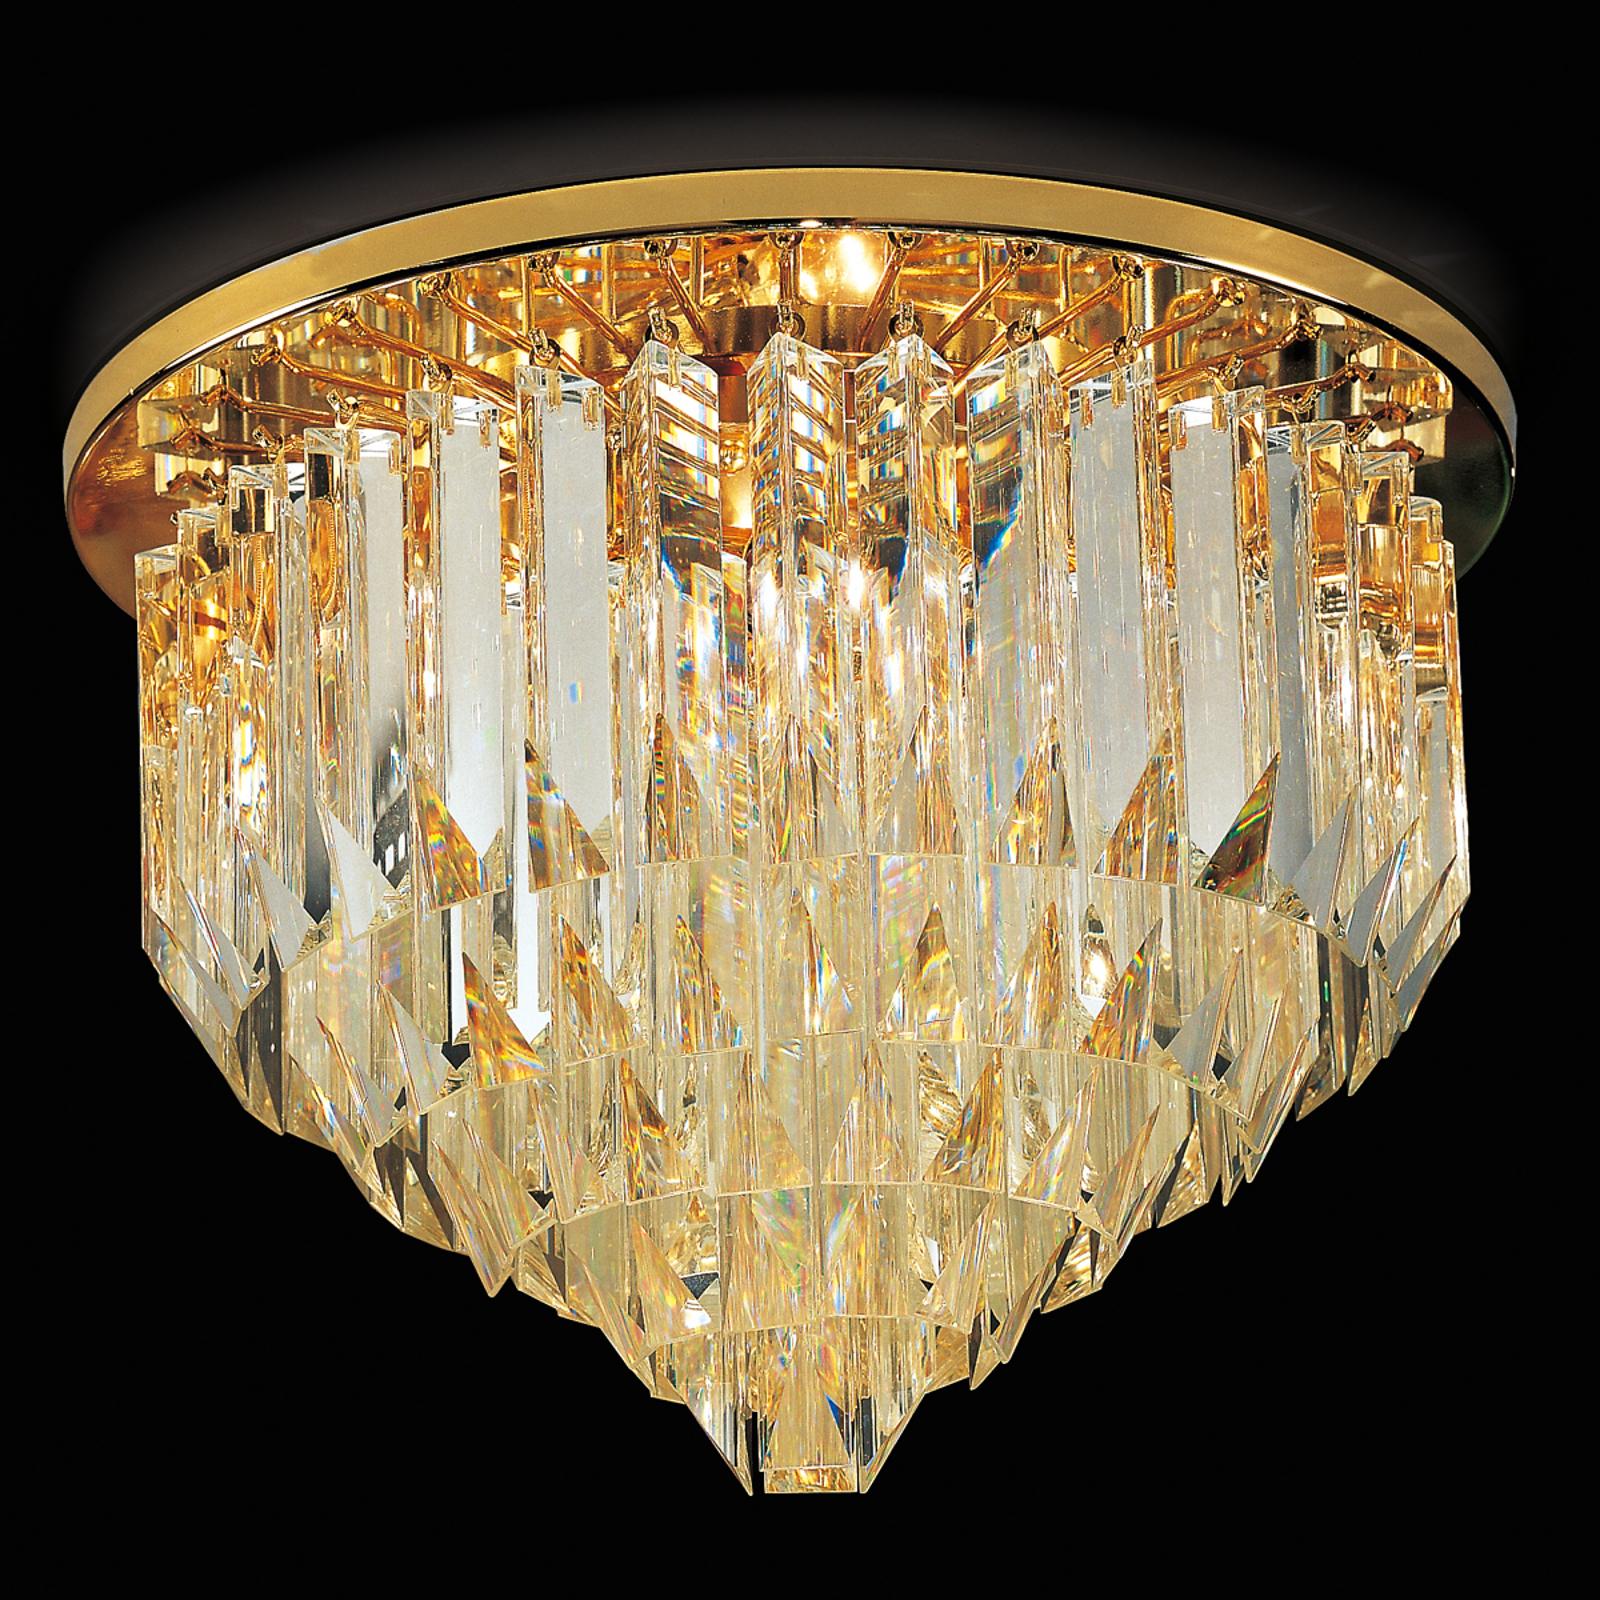 Cristalli taklampe, 45 cm i gull